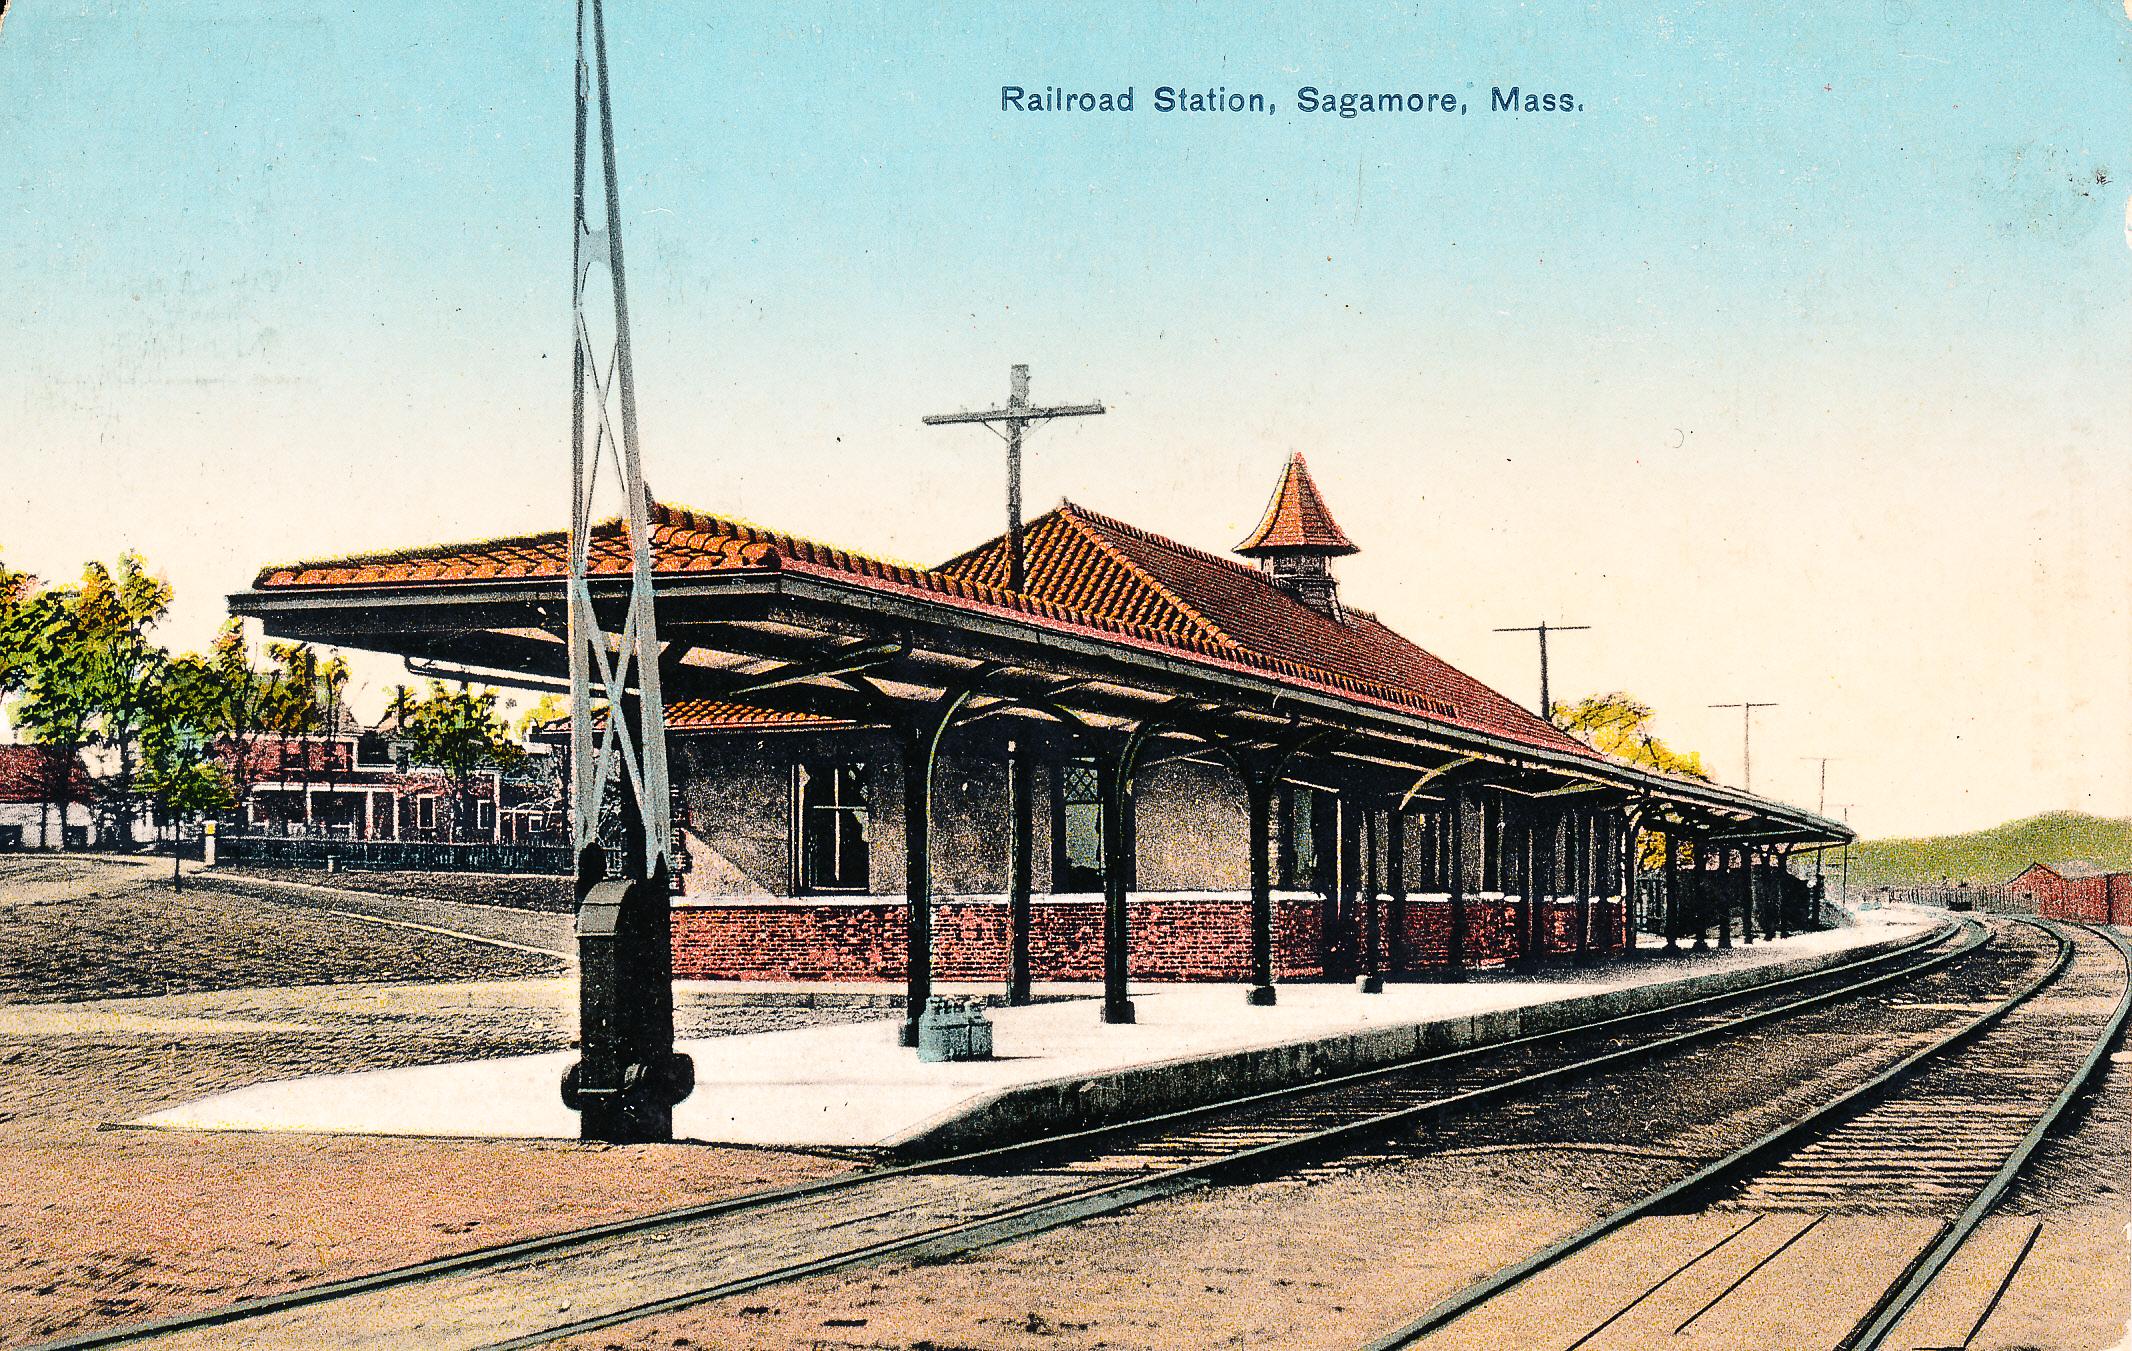 File:Railroad Station, Sagamore Mass.jpg - Wikimedia Commons